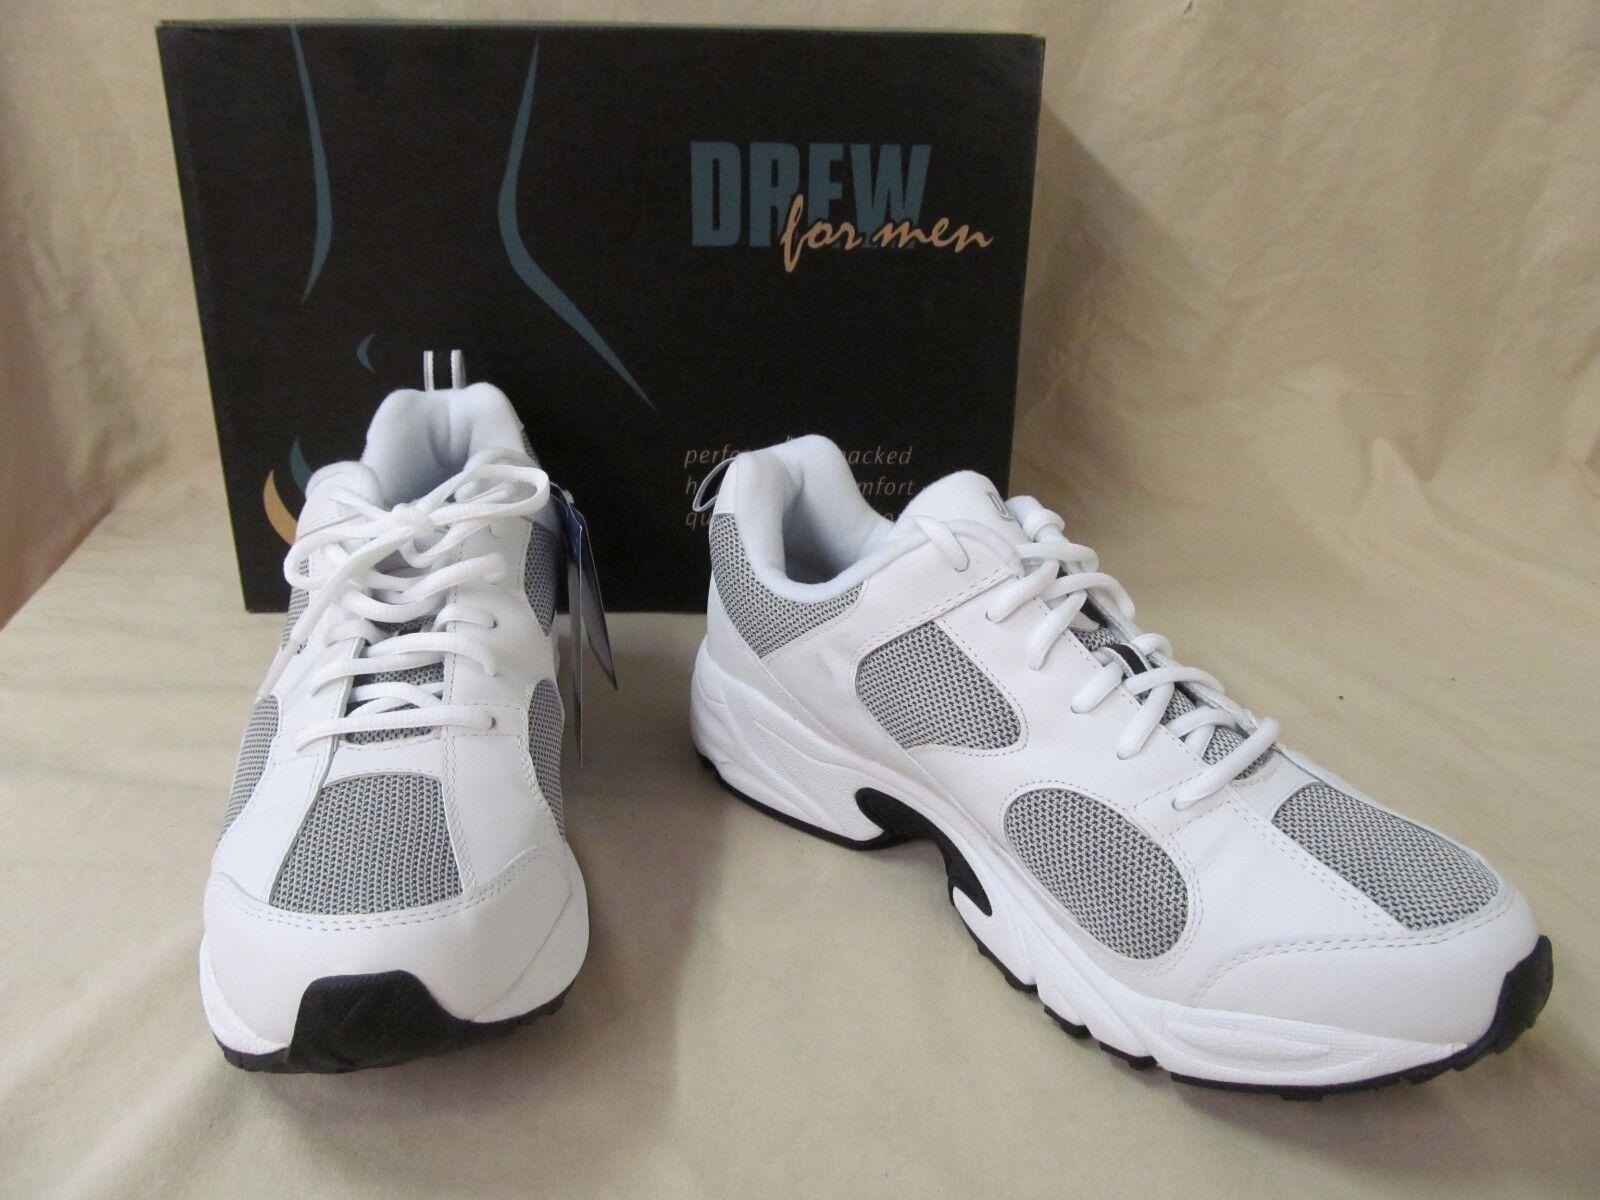 Drew 11.5 M Lightning White Pelle Orthotic Athletic Shoes  40767-07